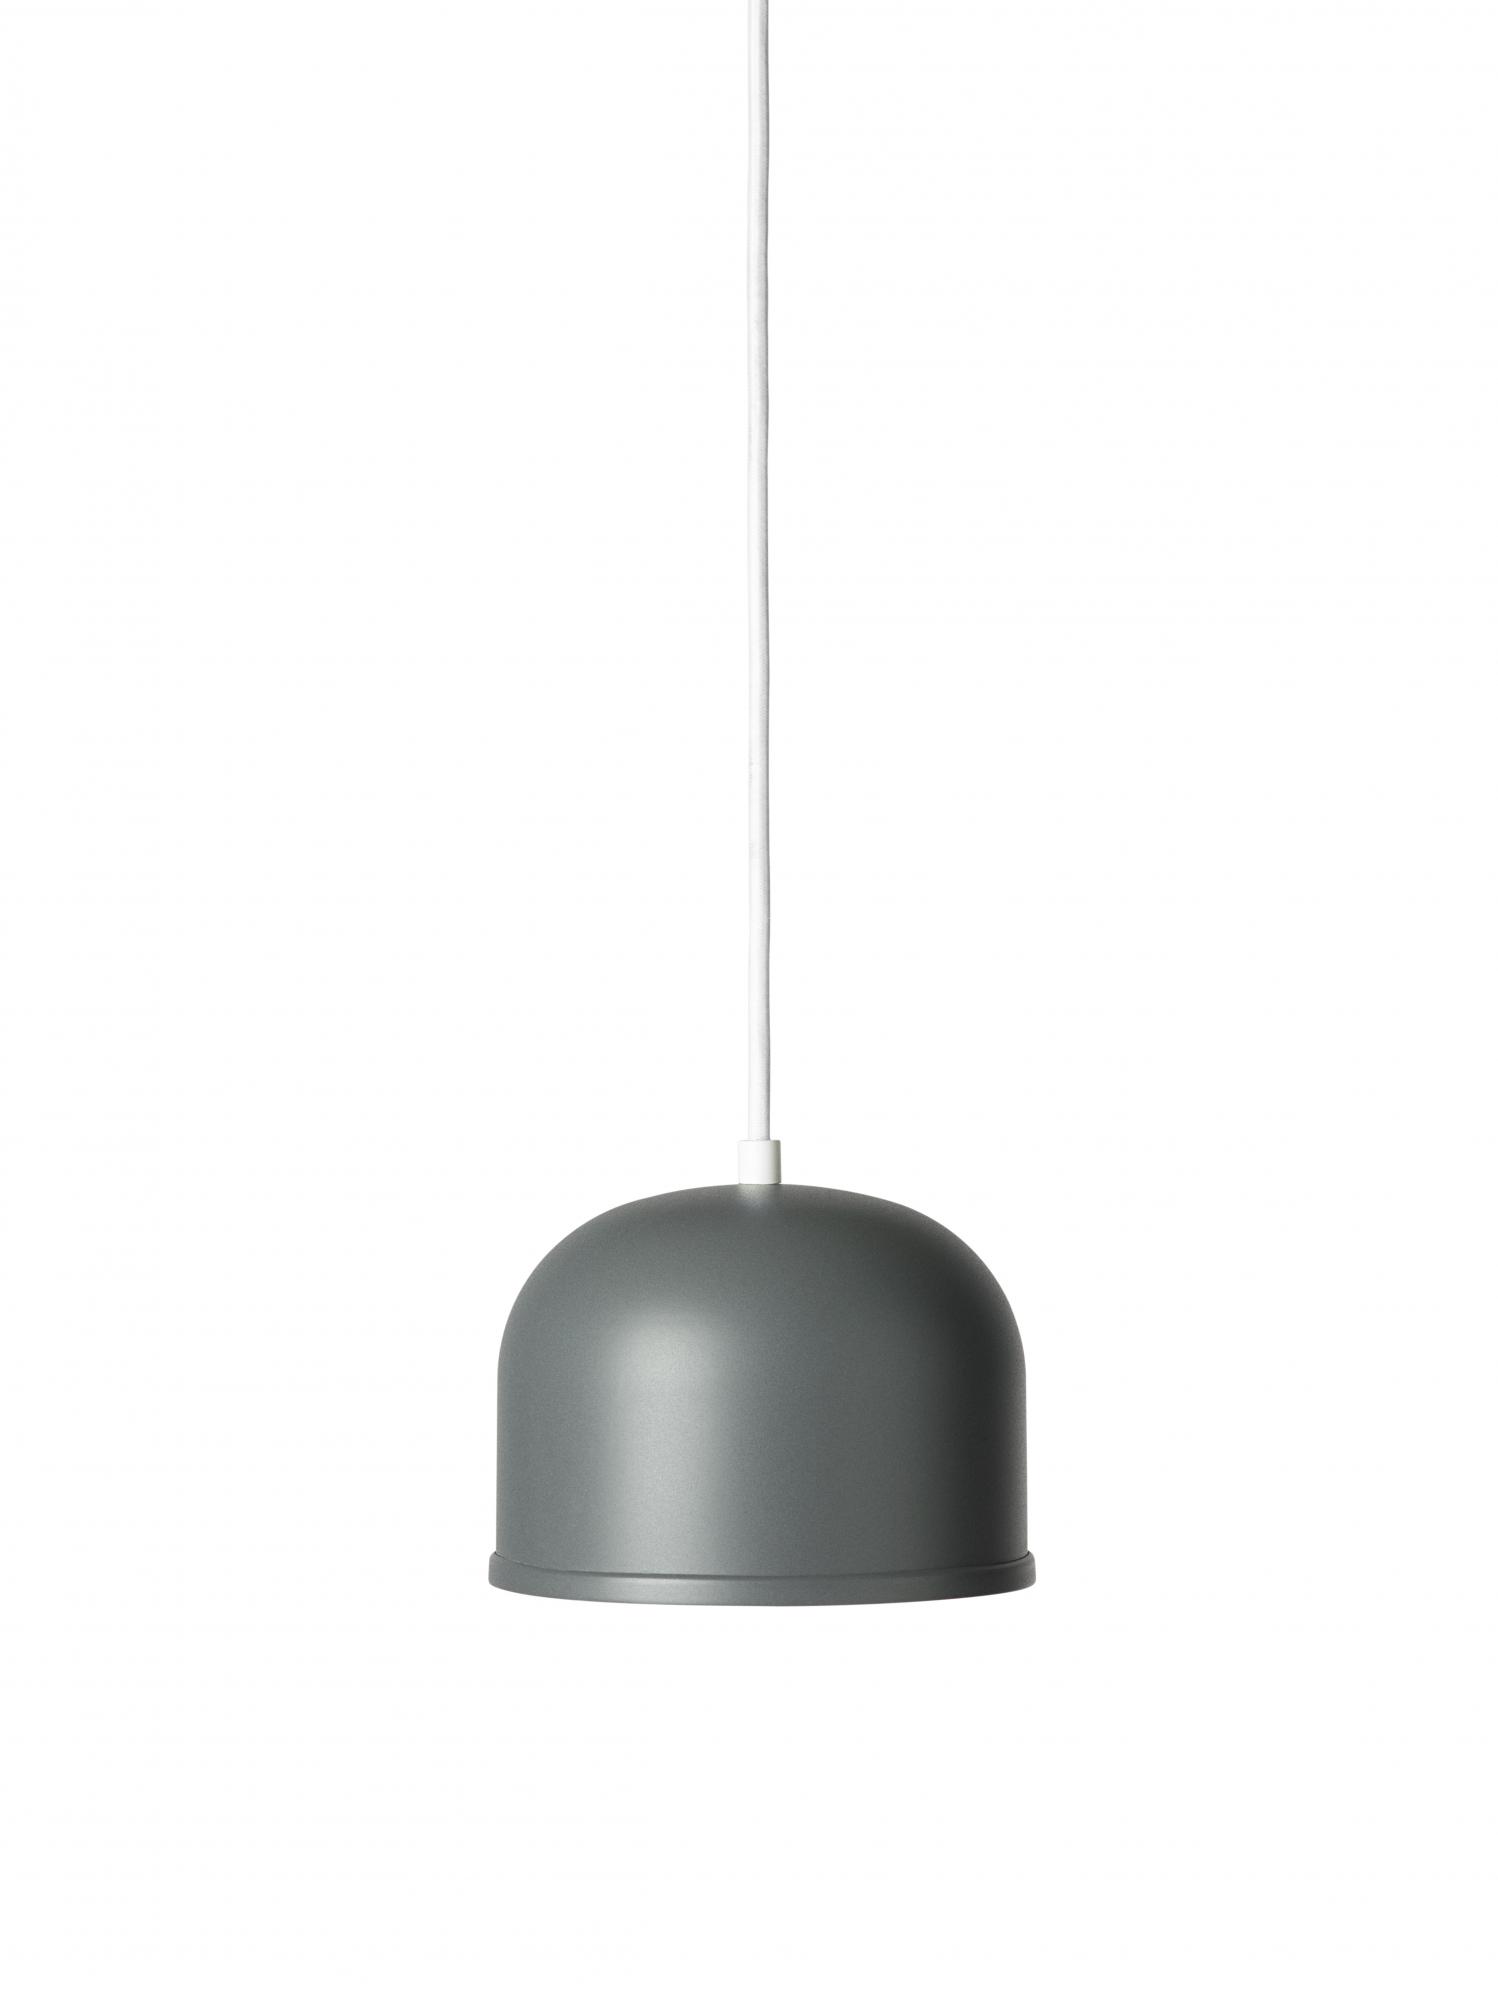 Lampa Wisząca Pendant GM 15  Basalt Grey (szary Bazaltowy)   Menu   DECO · Deco  Salon